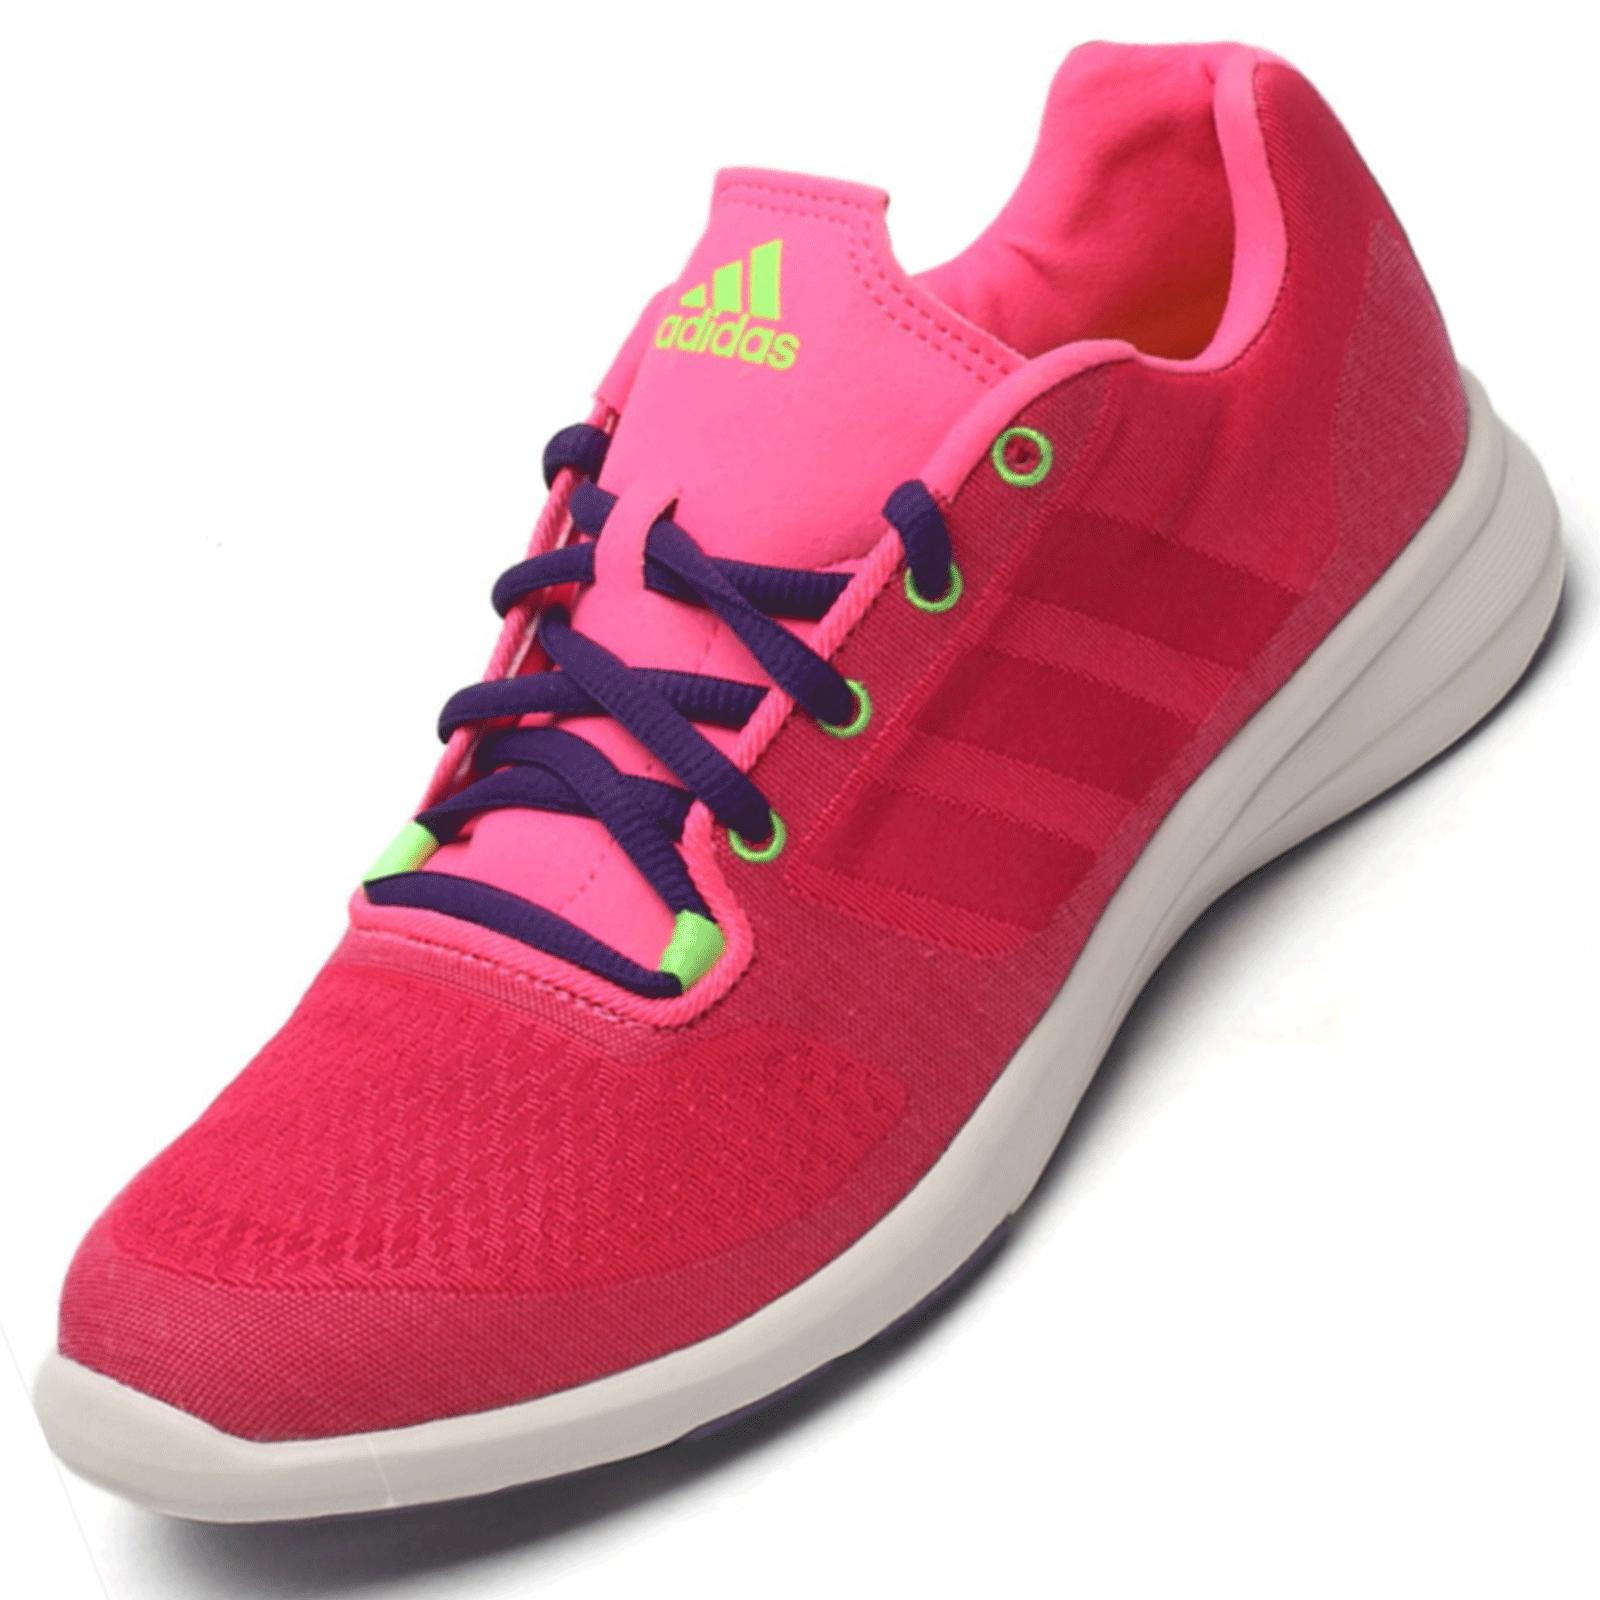 Adidas Woven Bliss W Damen Damen Damen Trainingsschuhe Turnschuhe Turnschuhe Neu  OVP cbeb3c